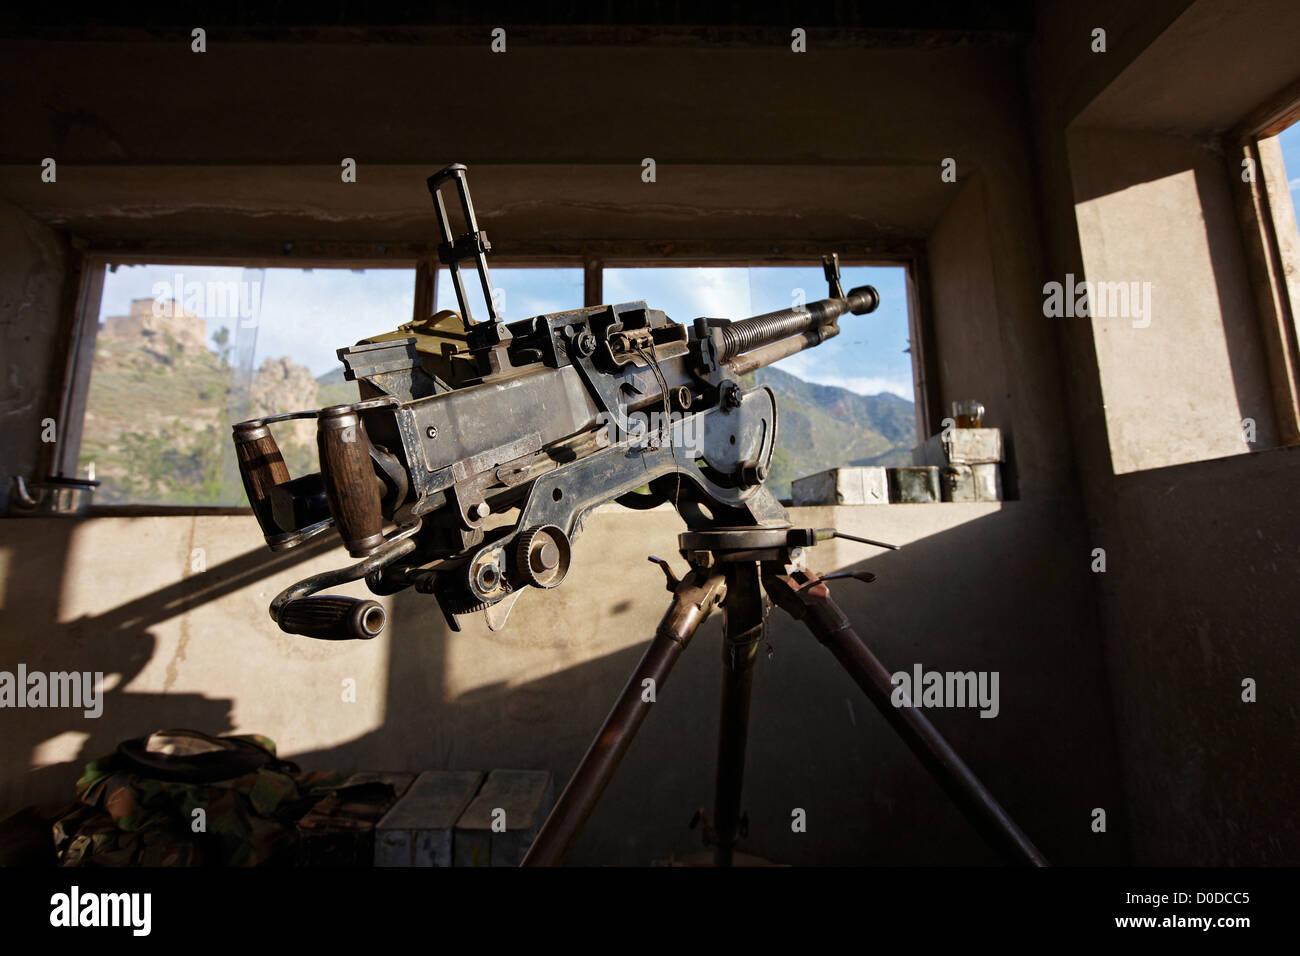 DShK 12.7mm Heavy Machine Gun in a Bunker - Stock Image